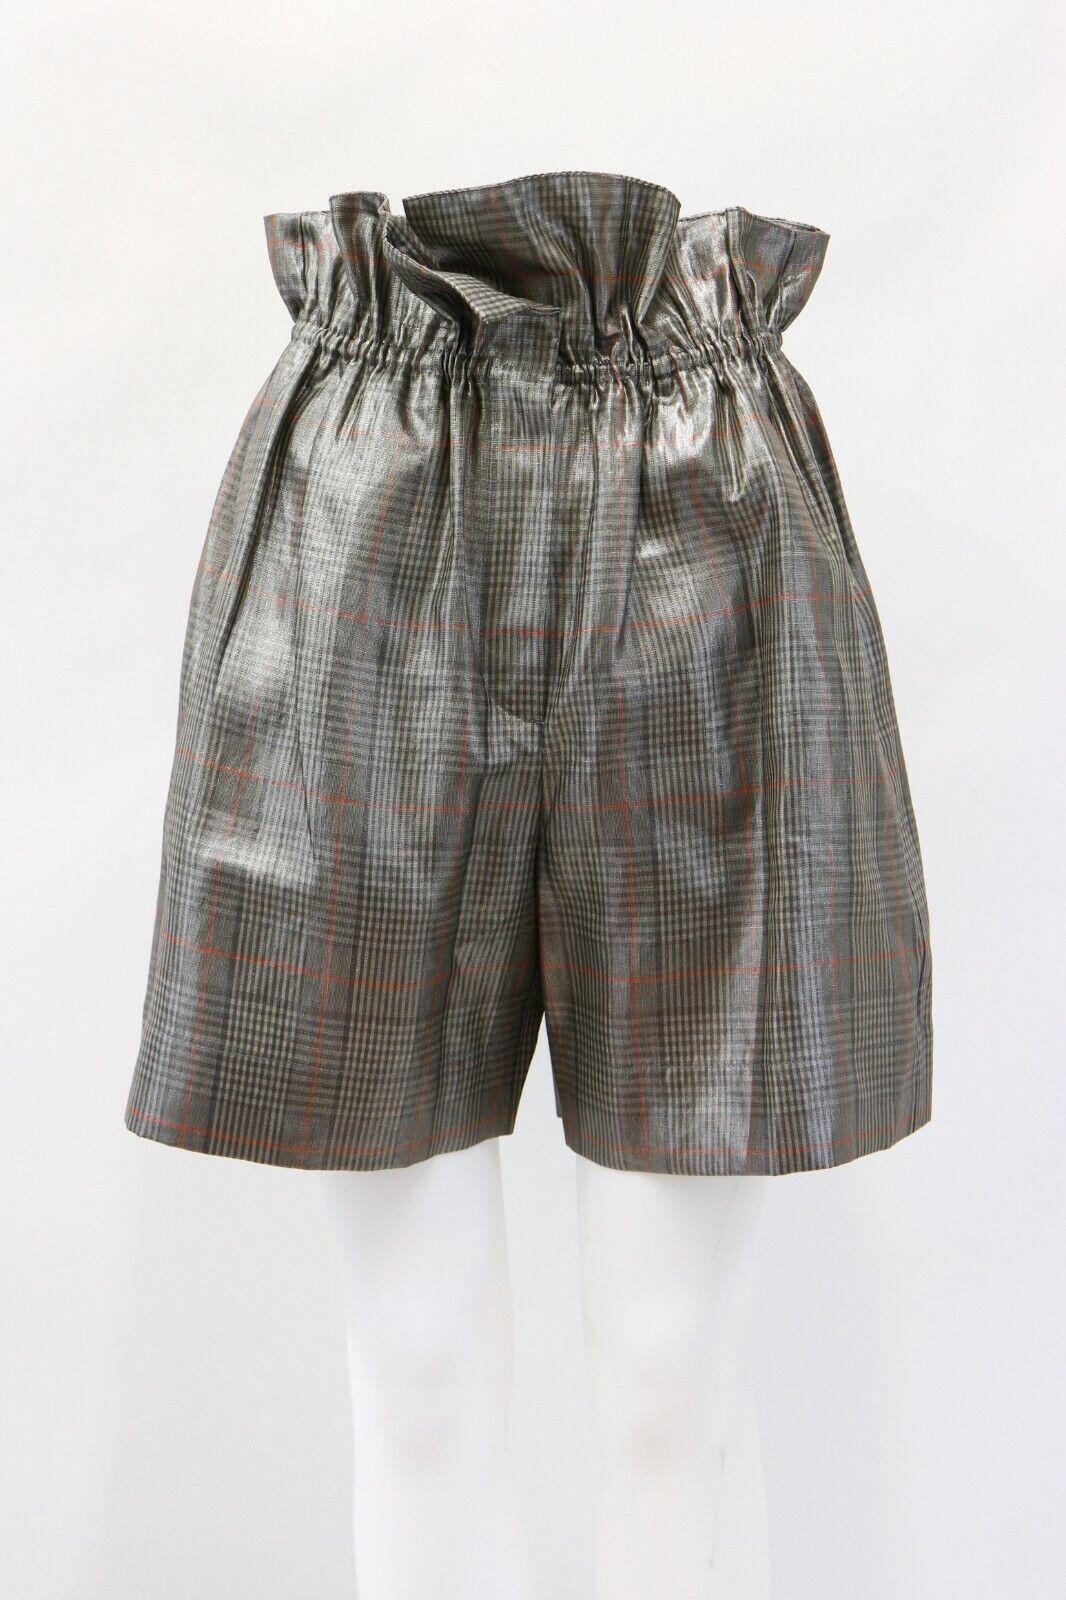 NWT  1075 Brunello Cucinelli damen 100% Linen Metallic Plaid Shorts 42 6US A186